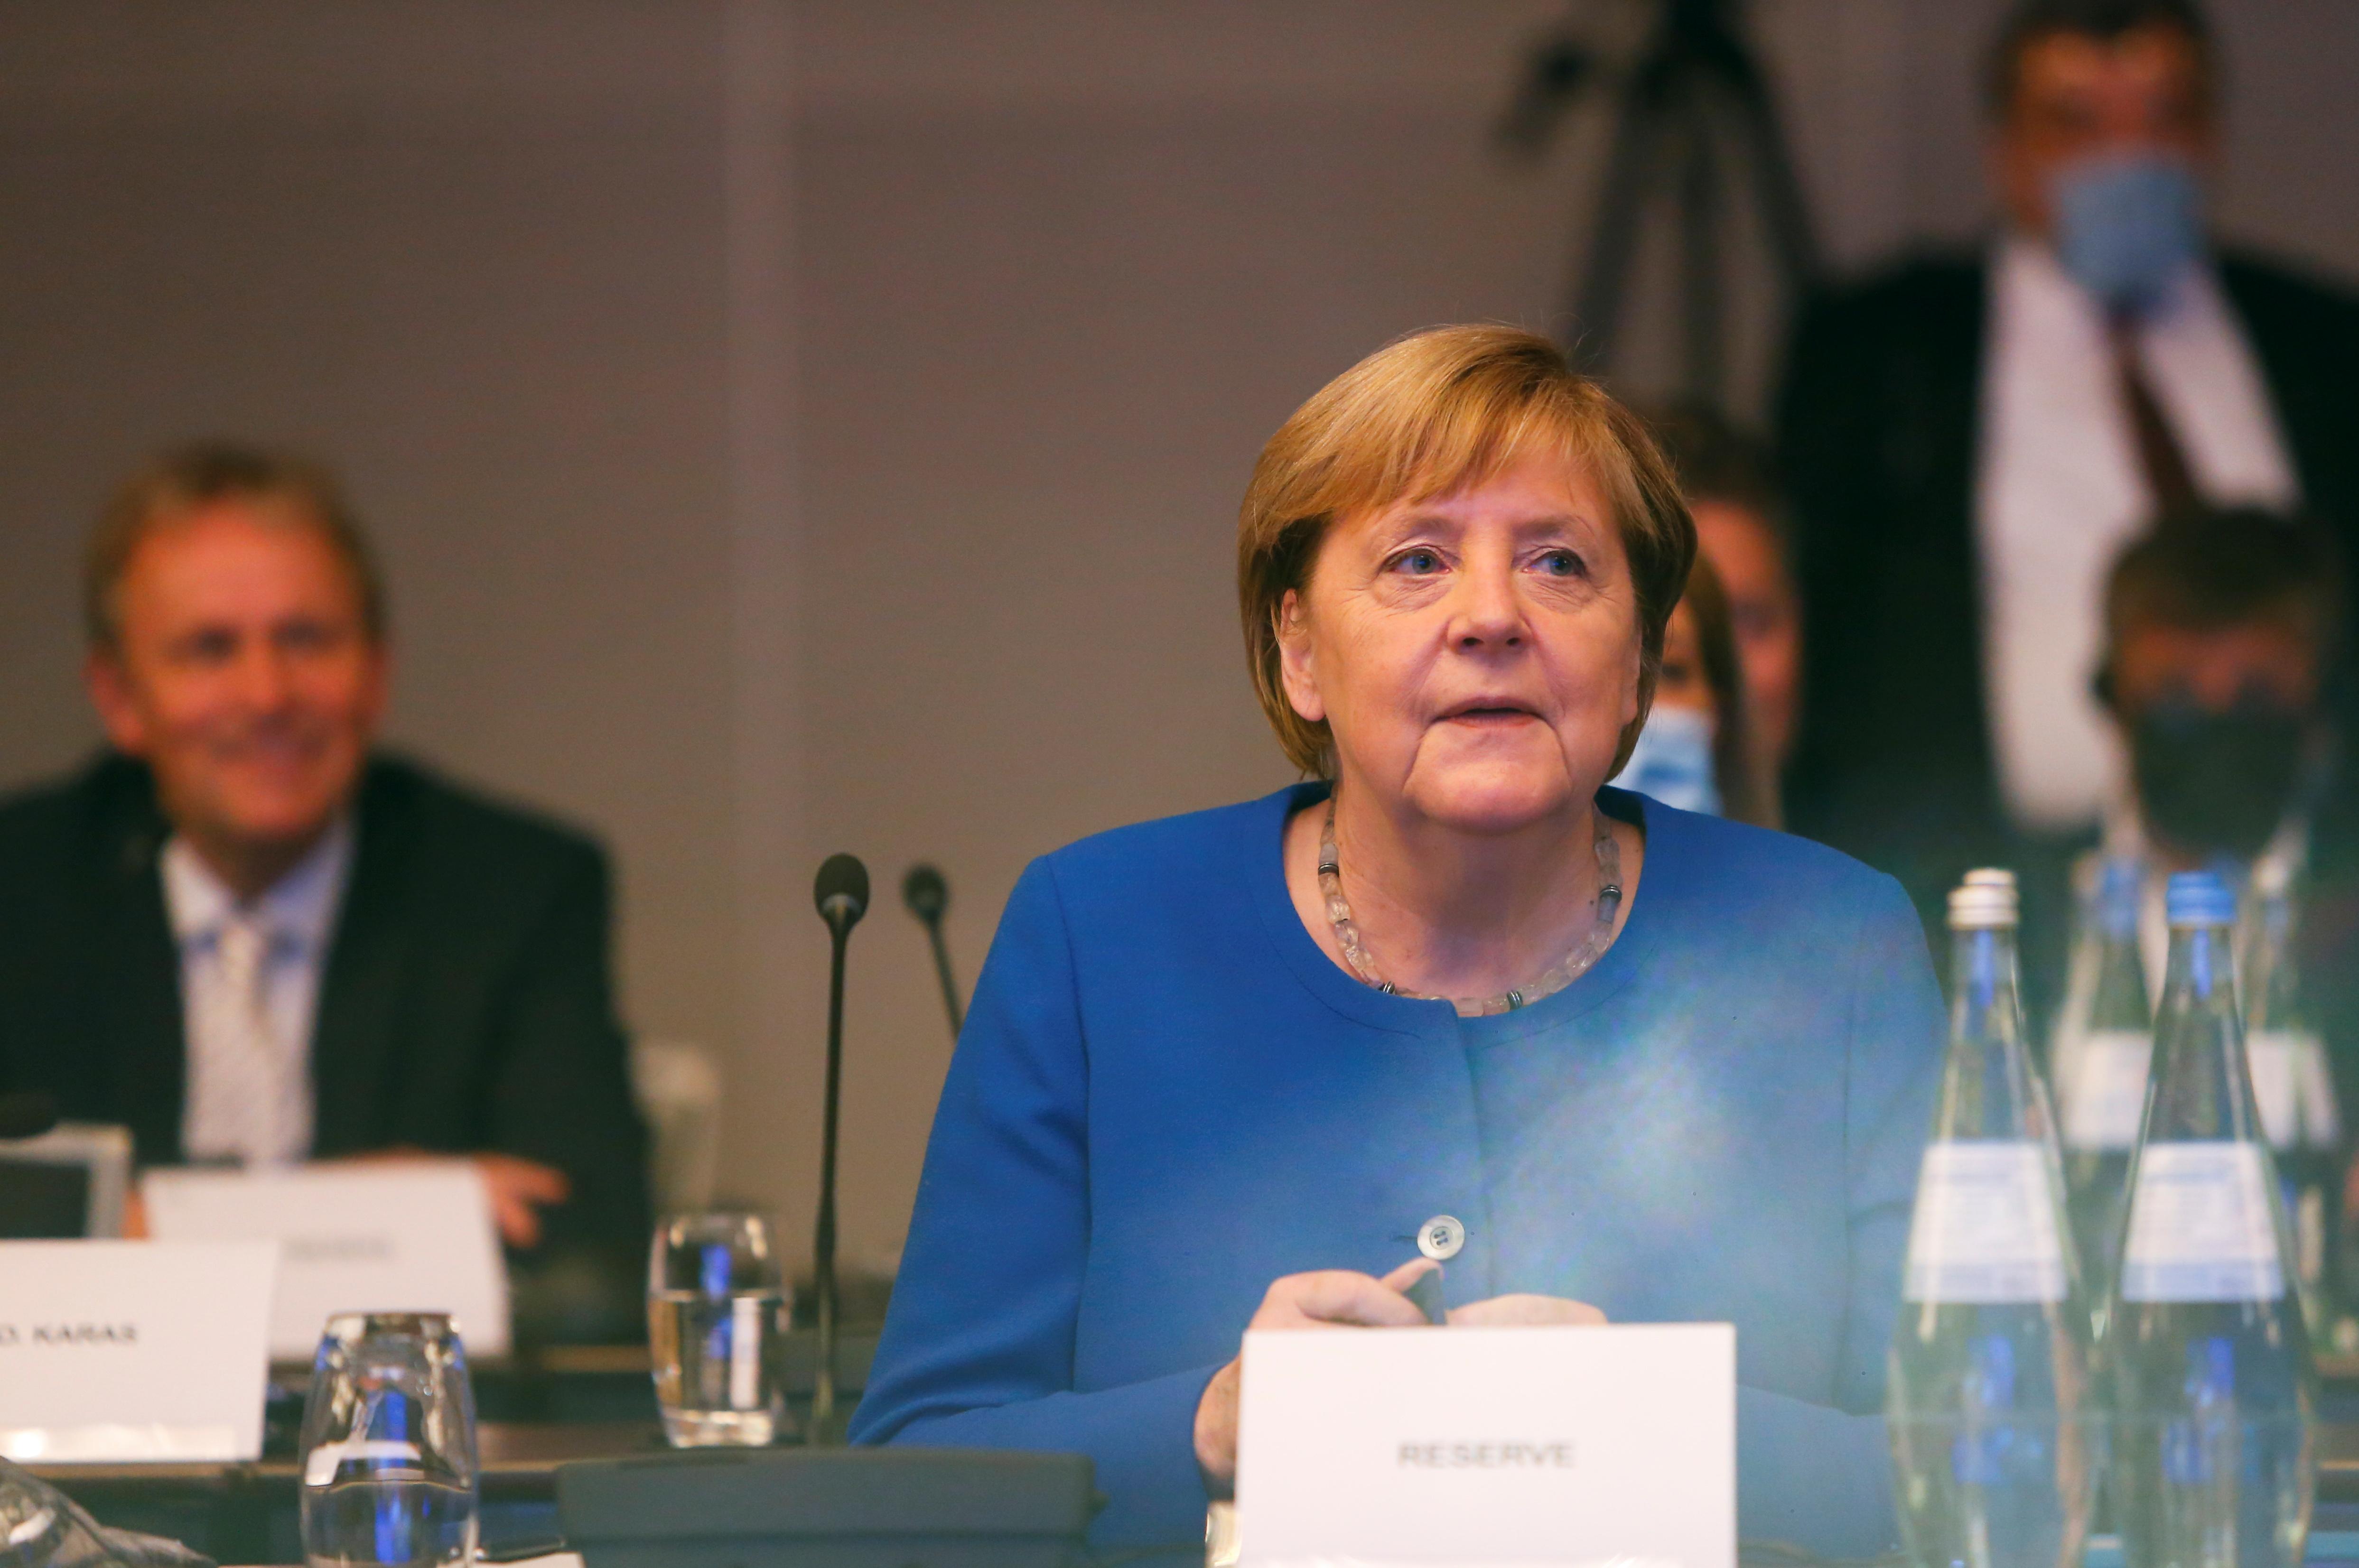 German Chancellor Angela Merkel attends the European People's Party (EPP) meeting in Berlin, Germany, September 9, 2021. REUTERS/Michele Tantussi